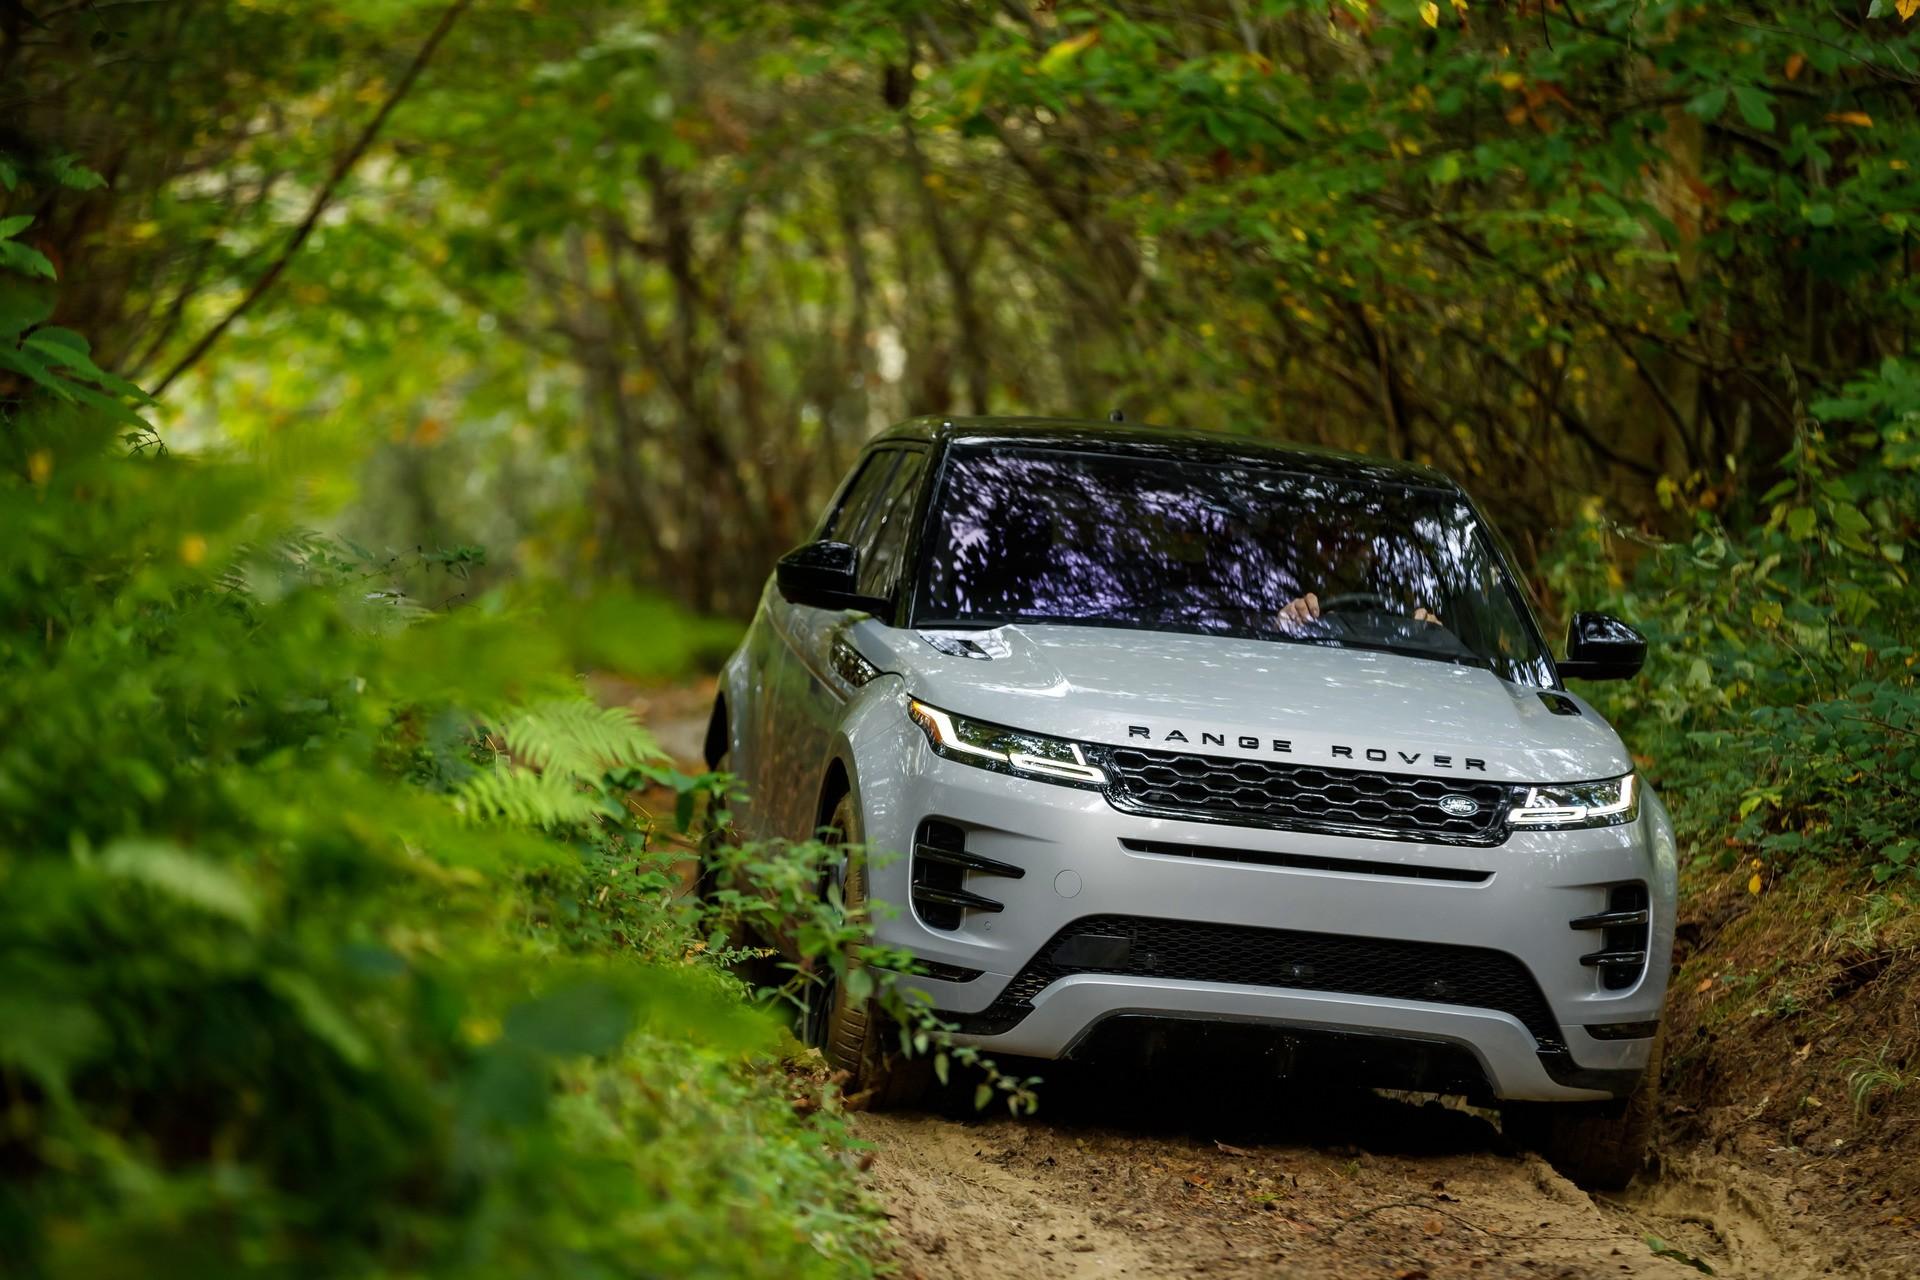 Range Rover Evoque (2020.)